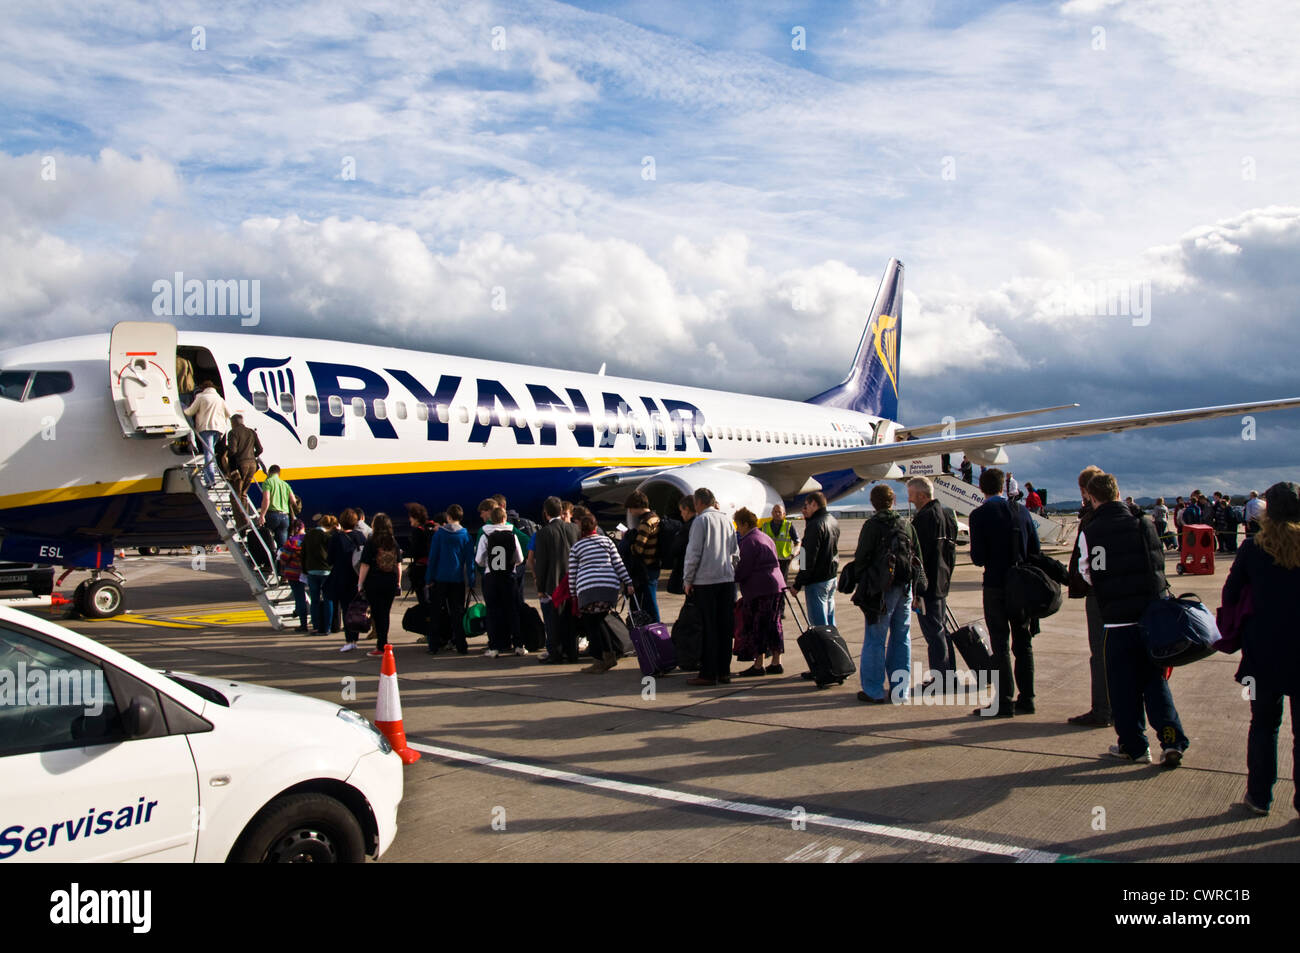 Passengers boarding a Ryanair flight - Stock Image